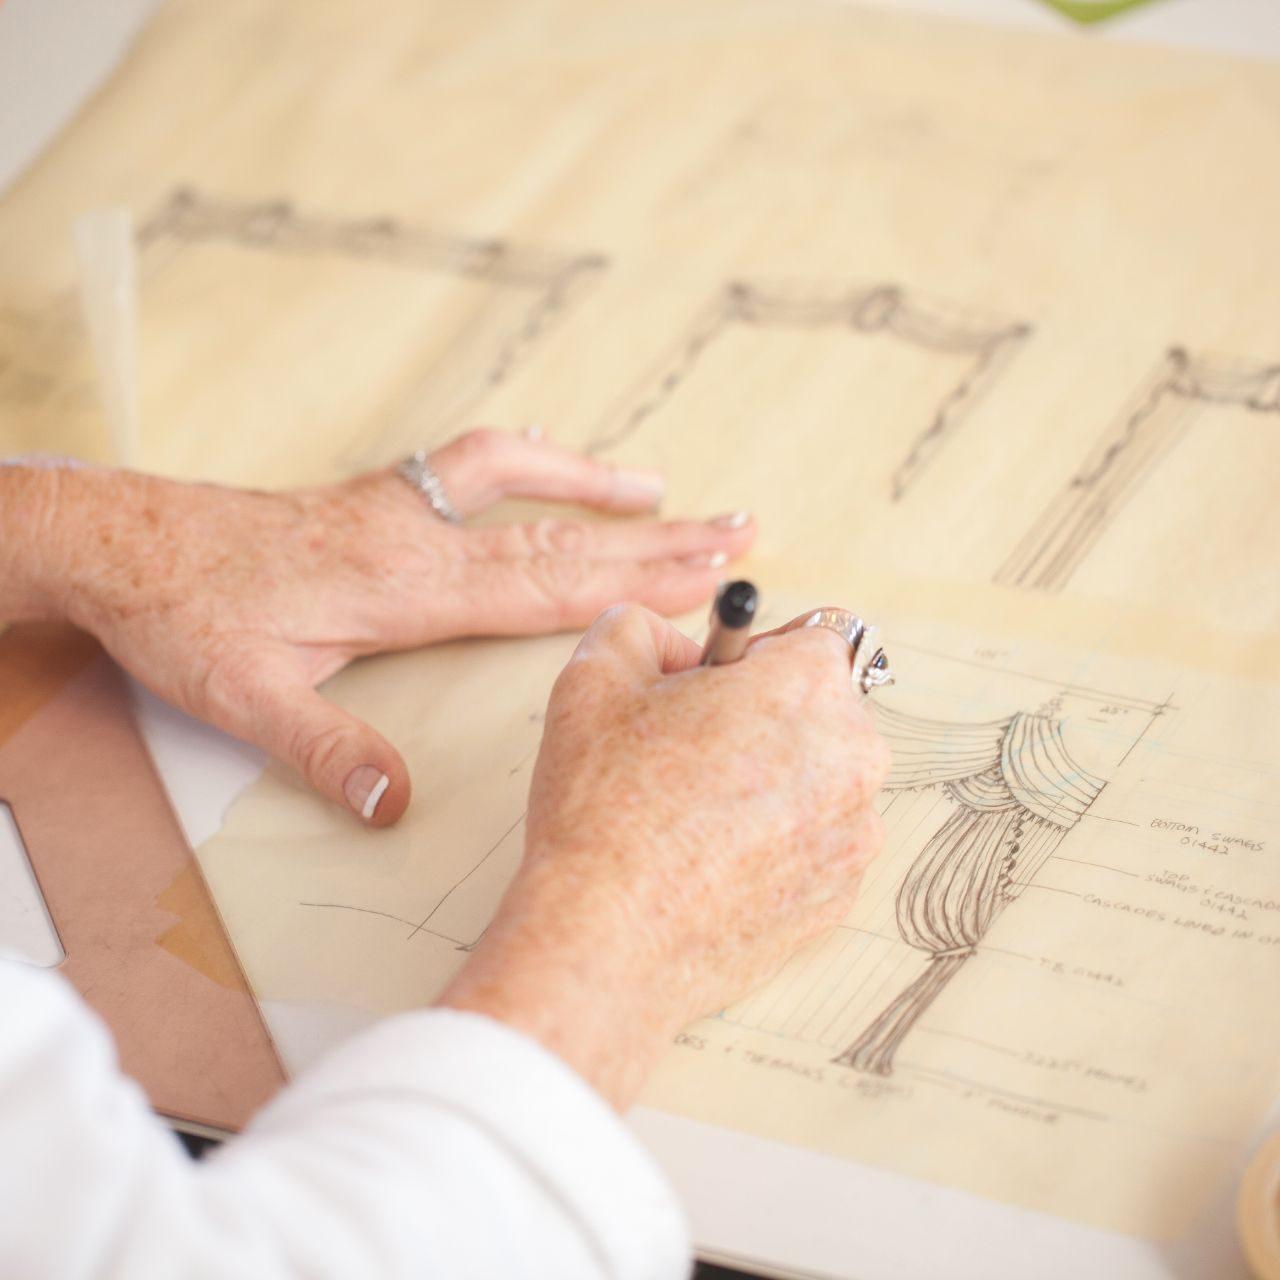 Sketching a design